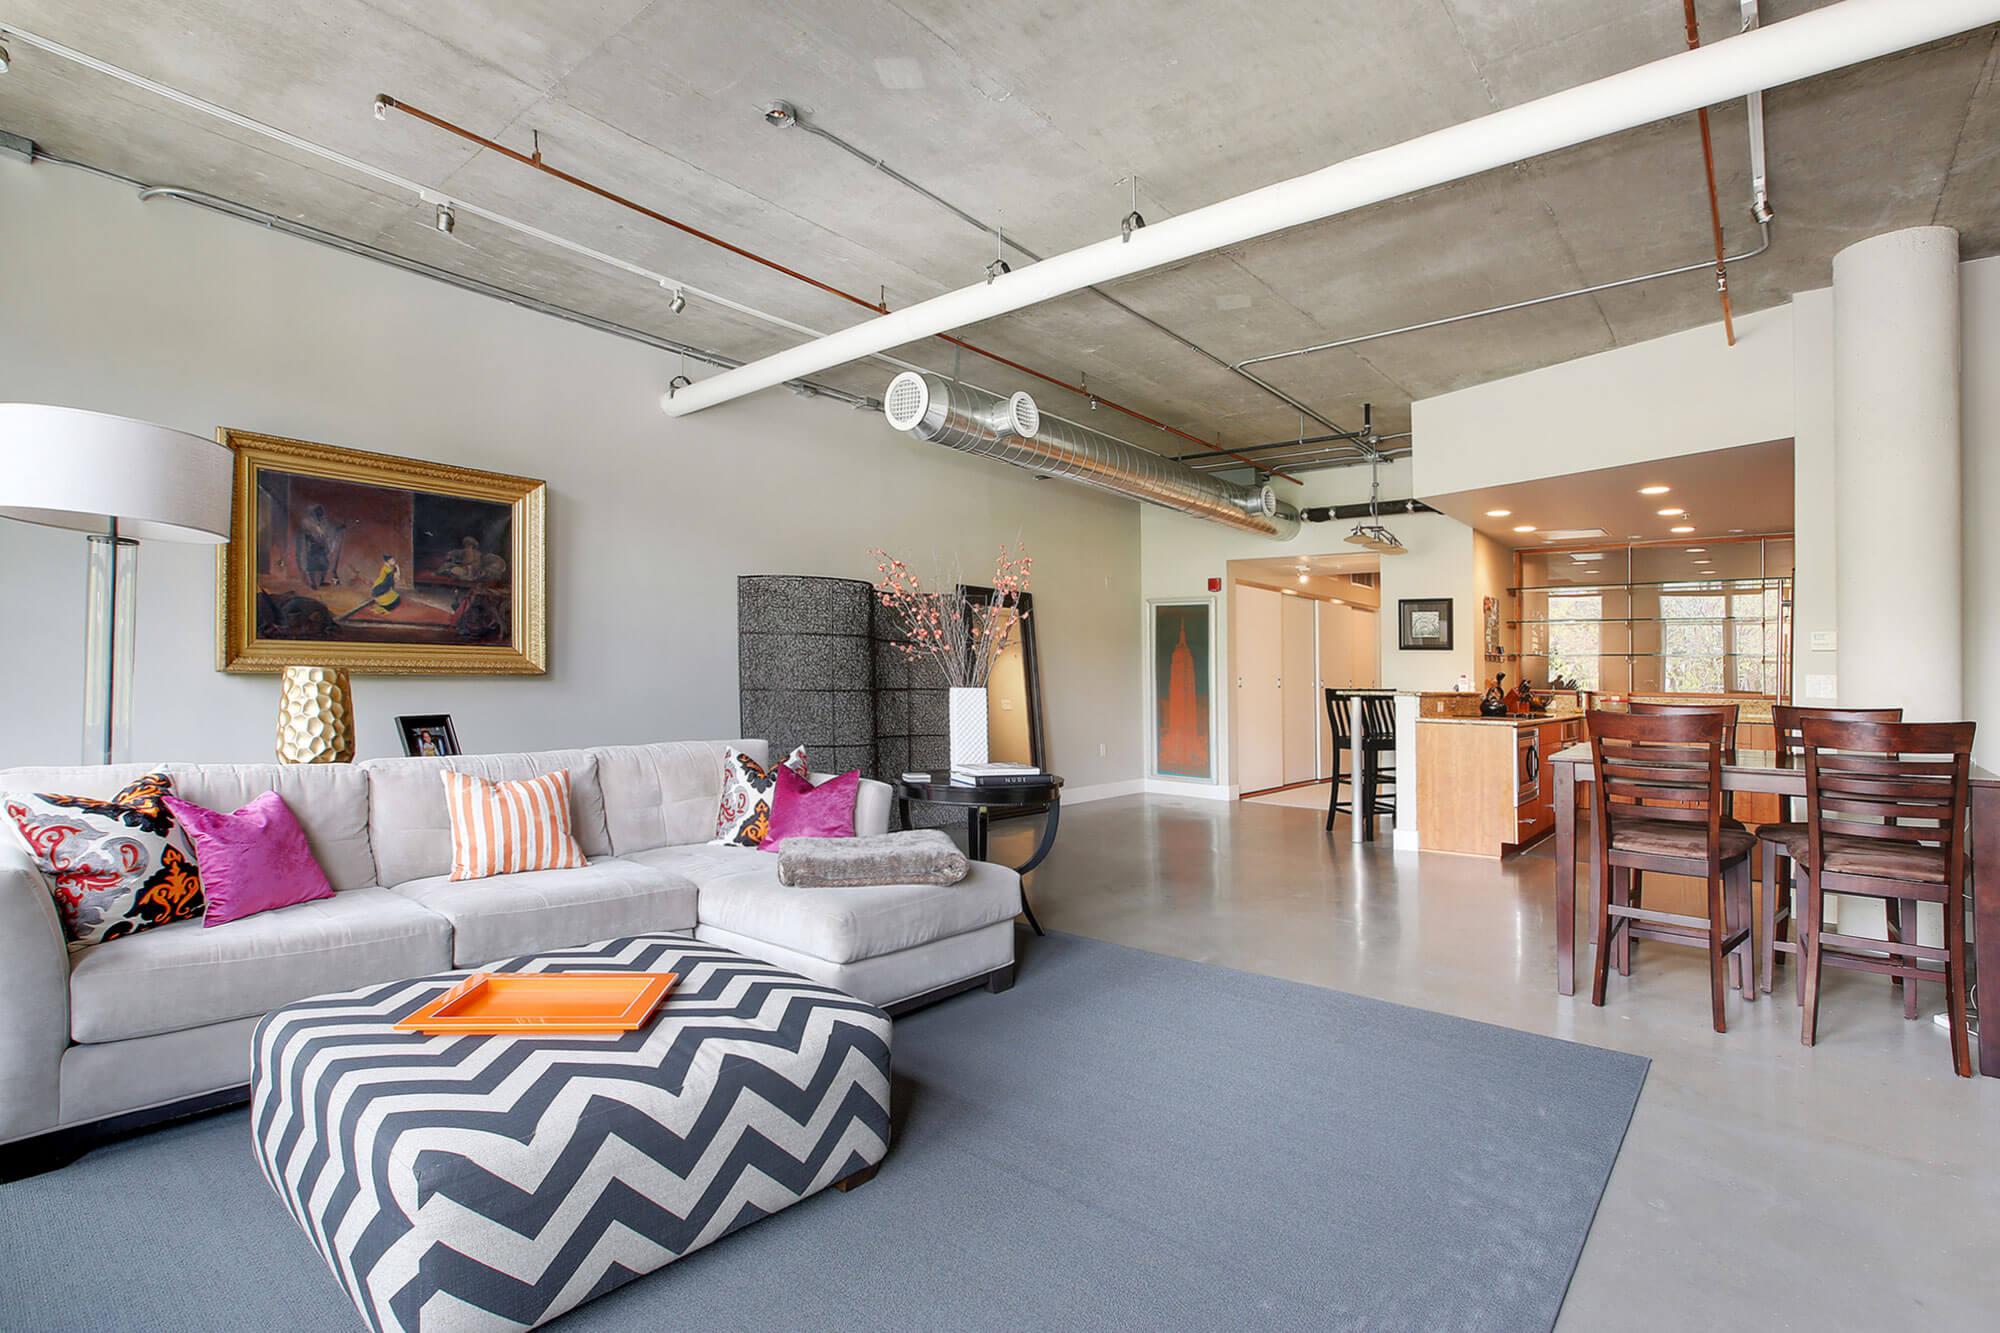 downtown lofts for sale Denver's preeminent luxury residences Titanium Lofts